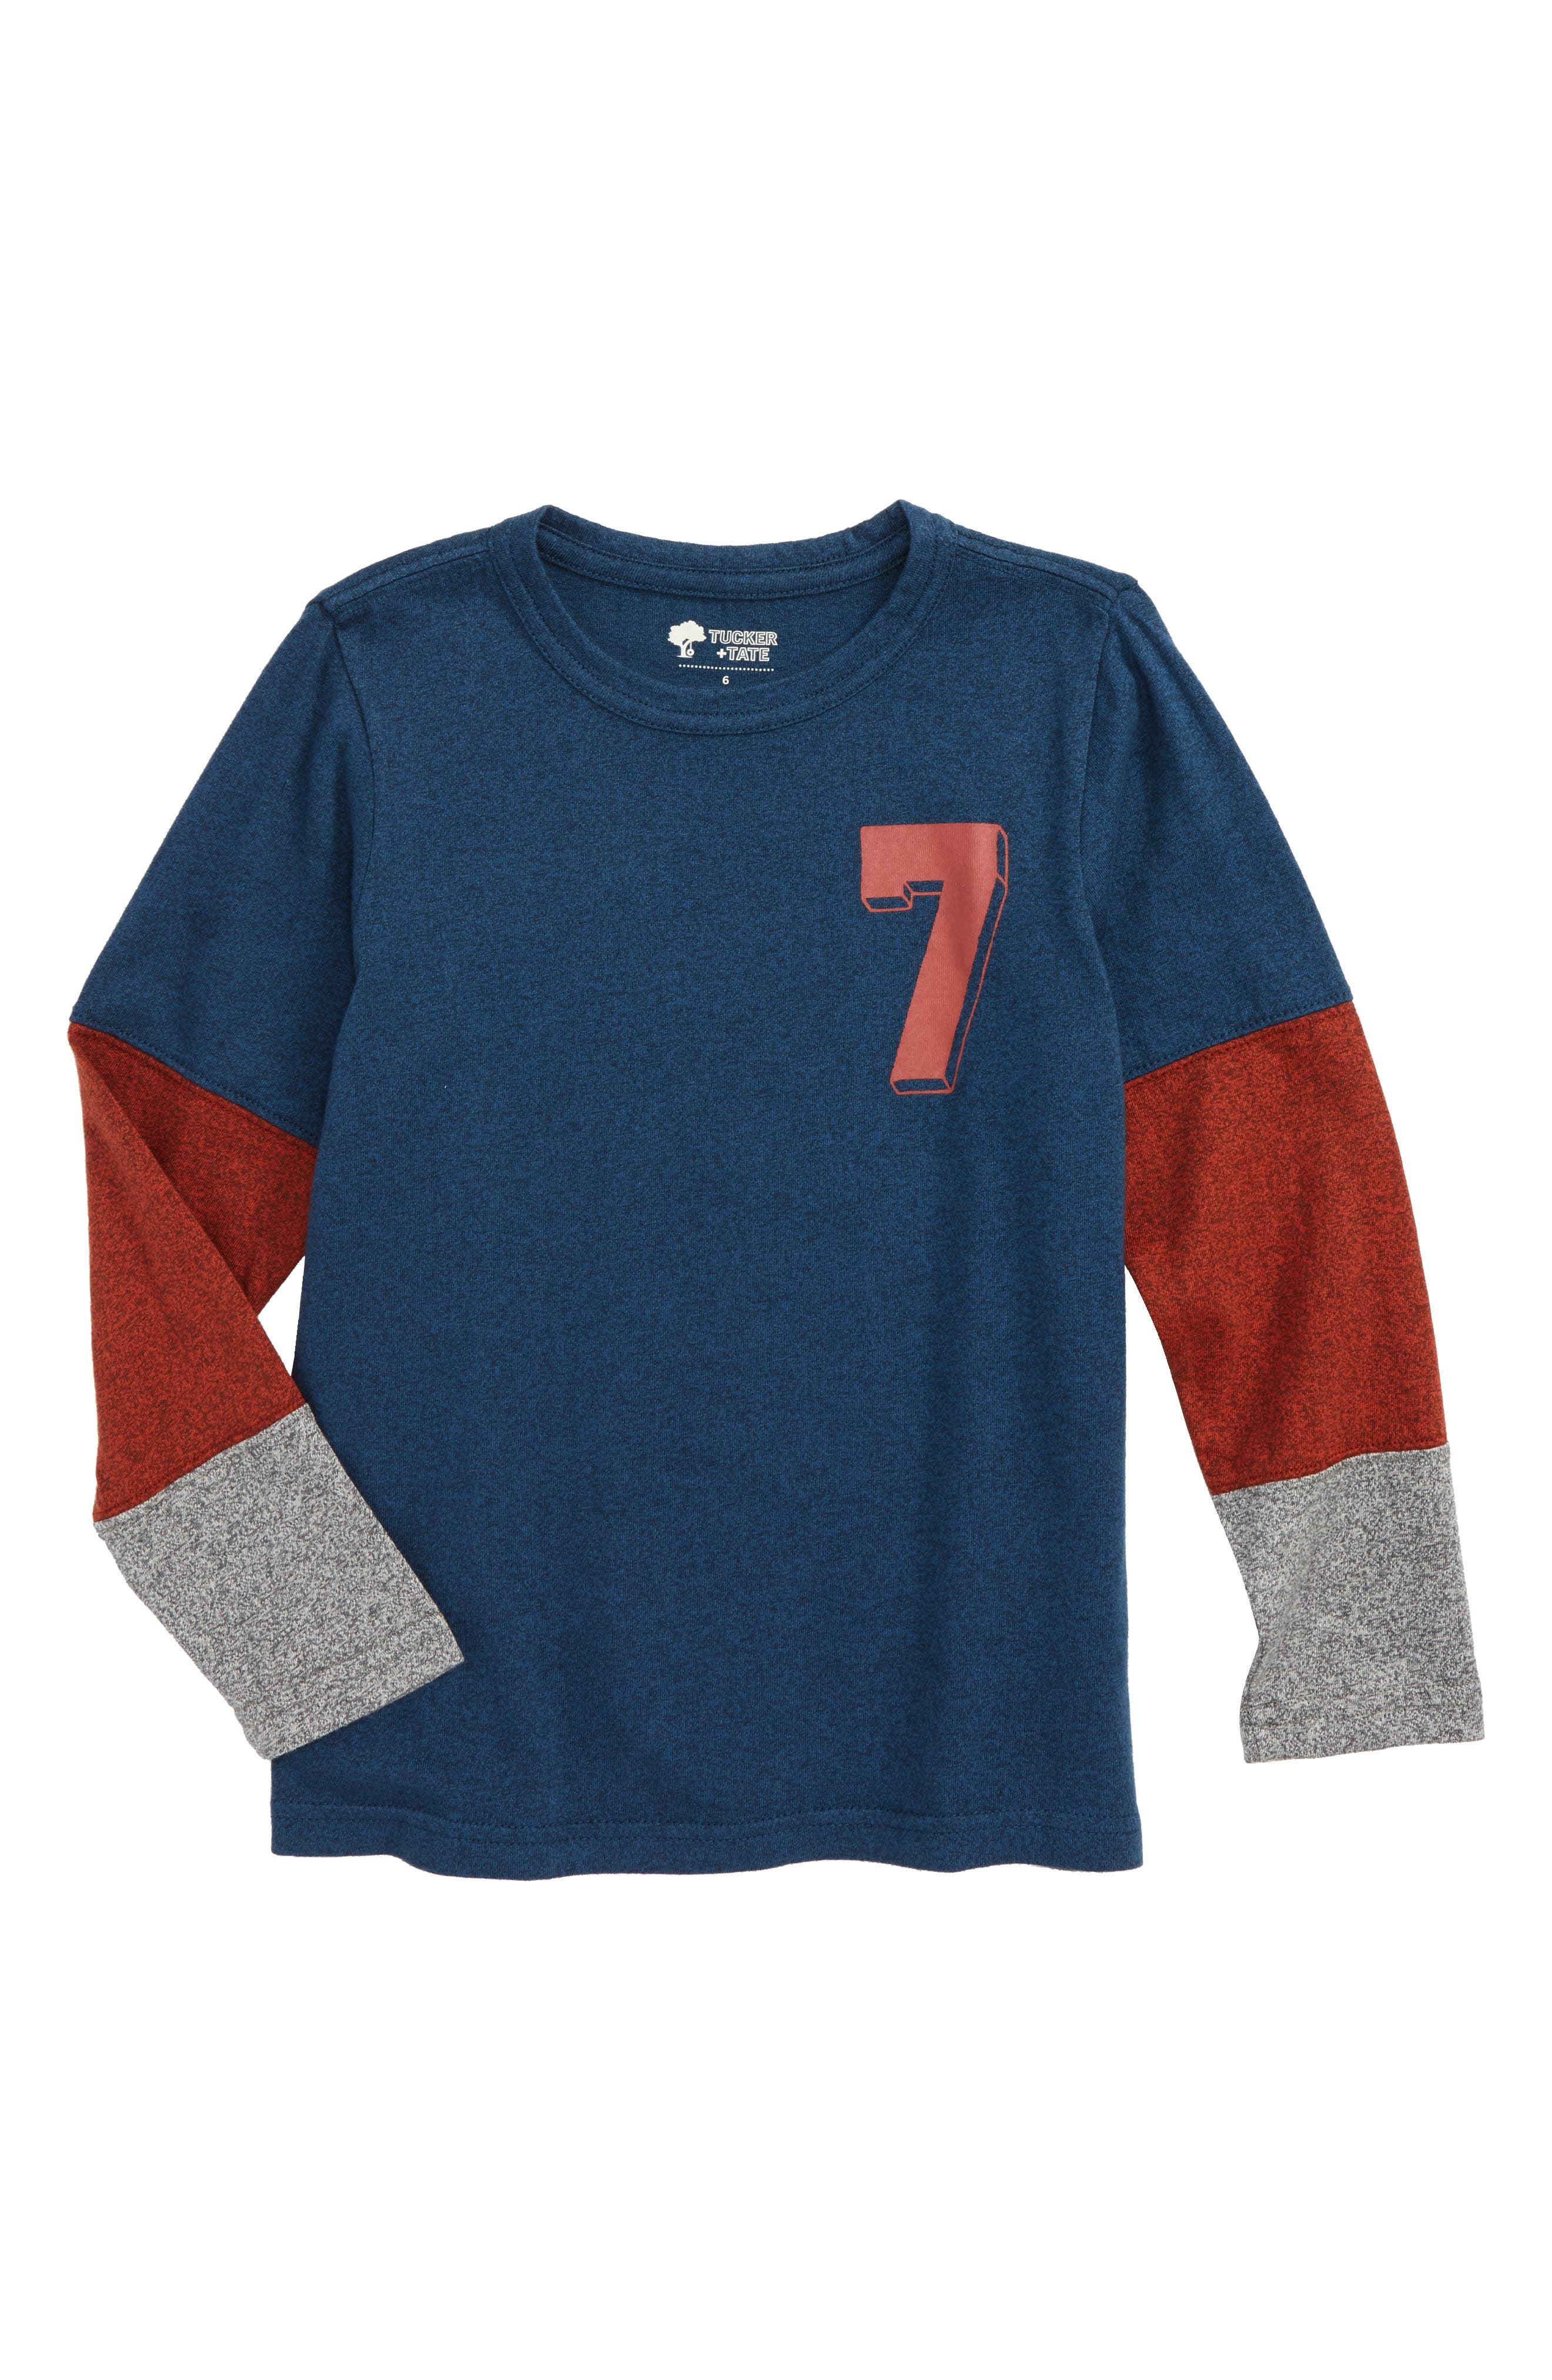 Main Image - Tucker + Tate Pieced Sleeve T-Shirt (Toddler Boys & Little Boys)